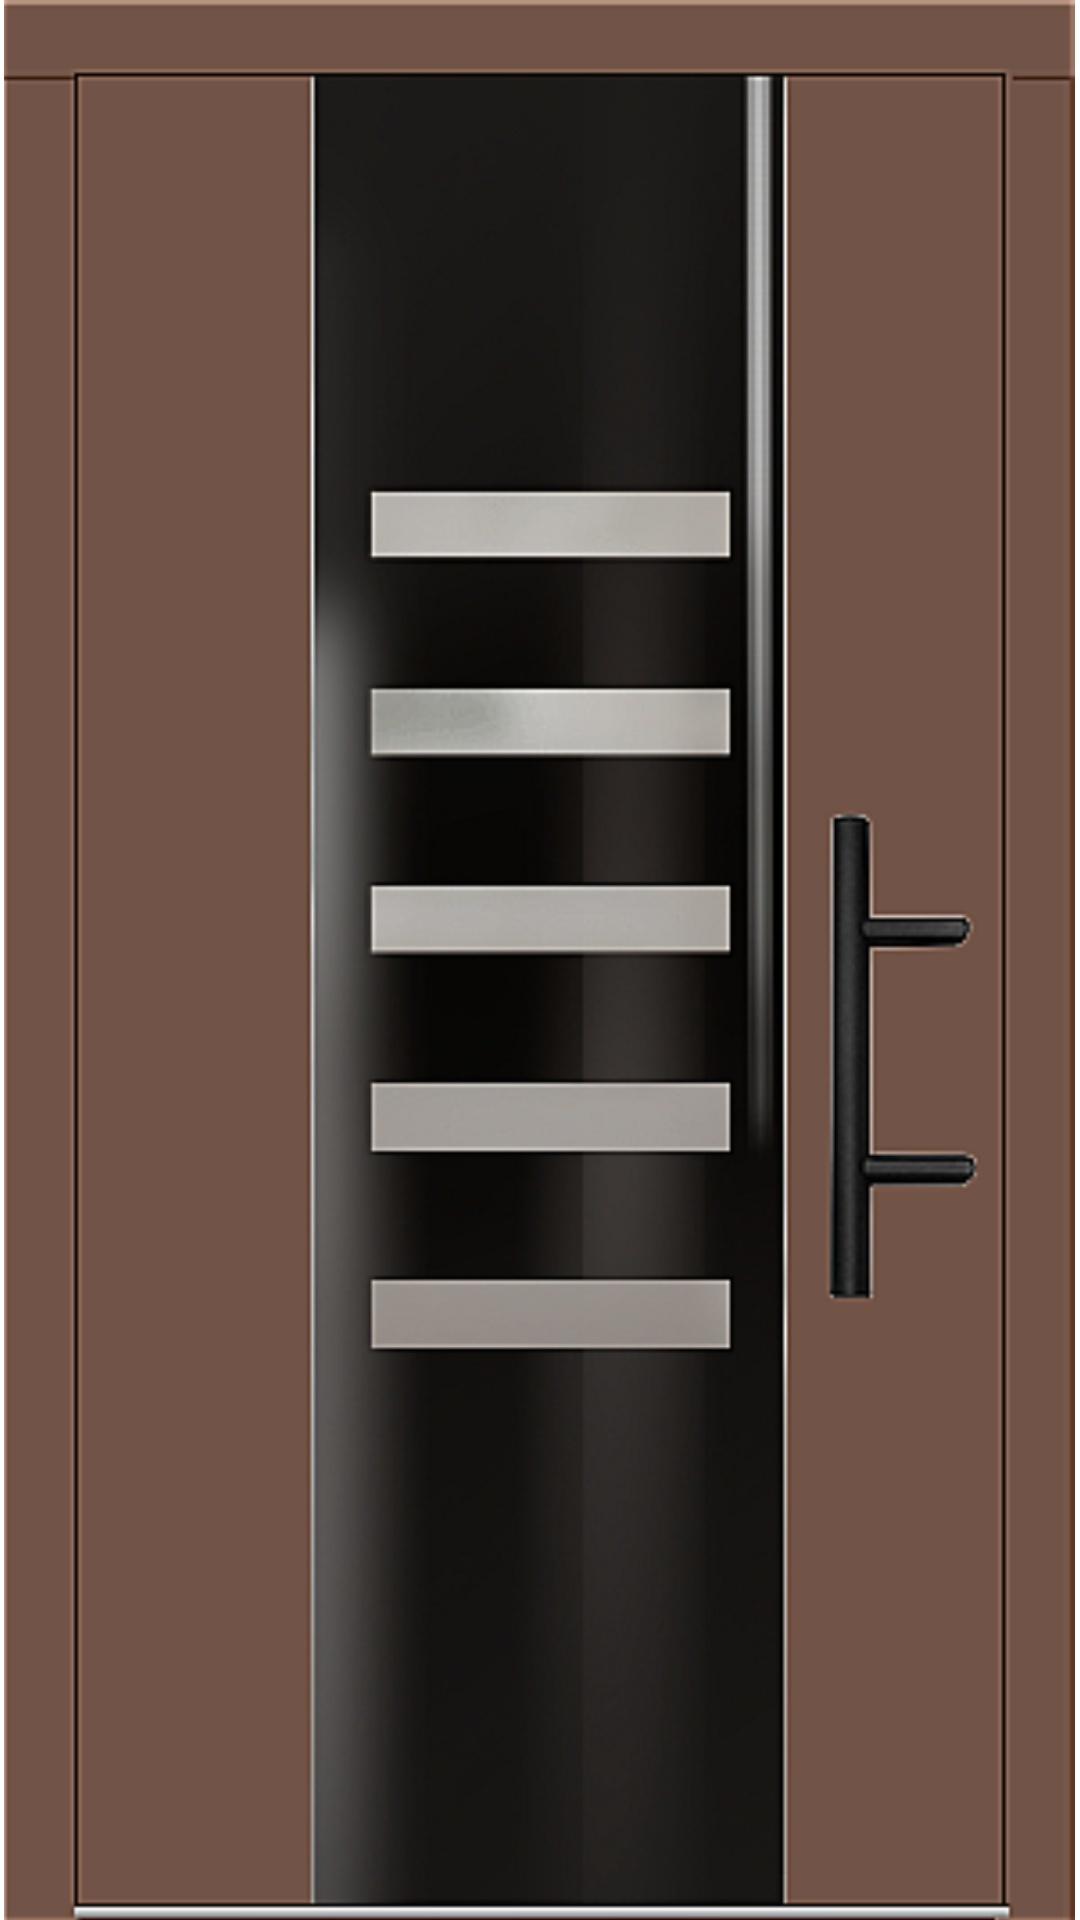 Holz Haustür Modell 70210 lehmbraun